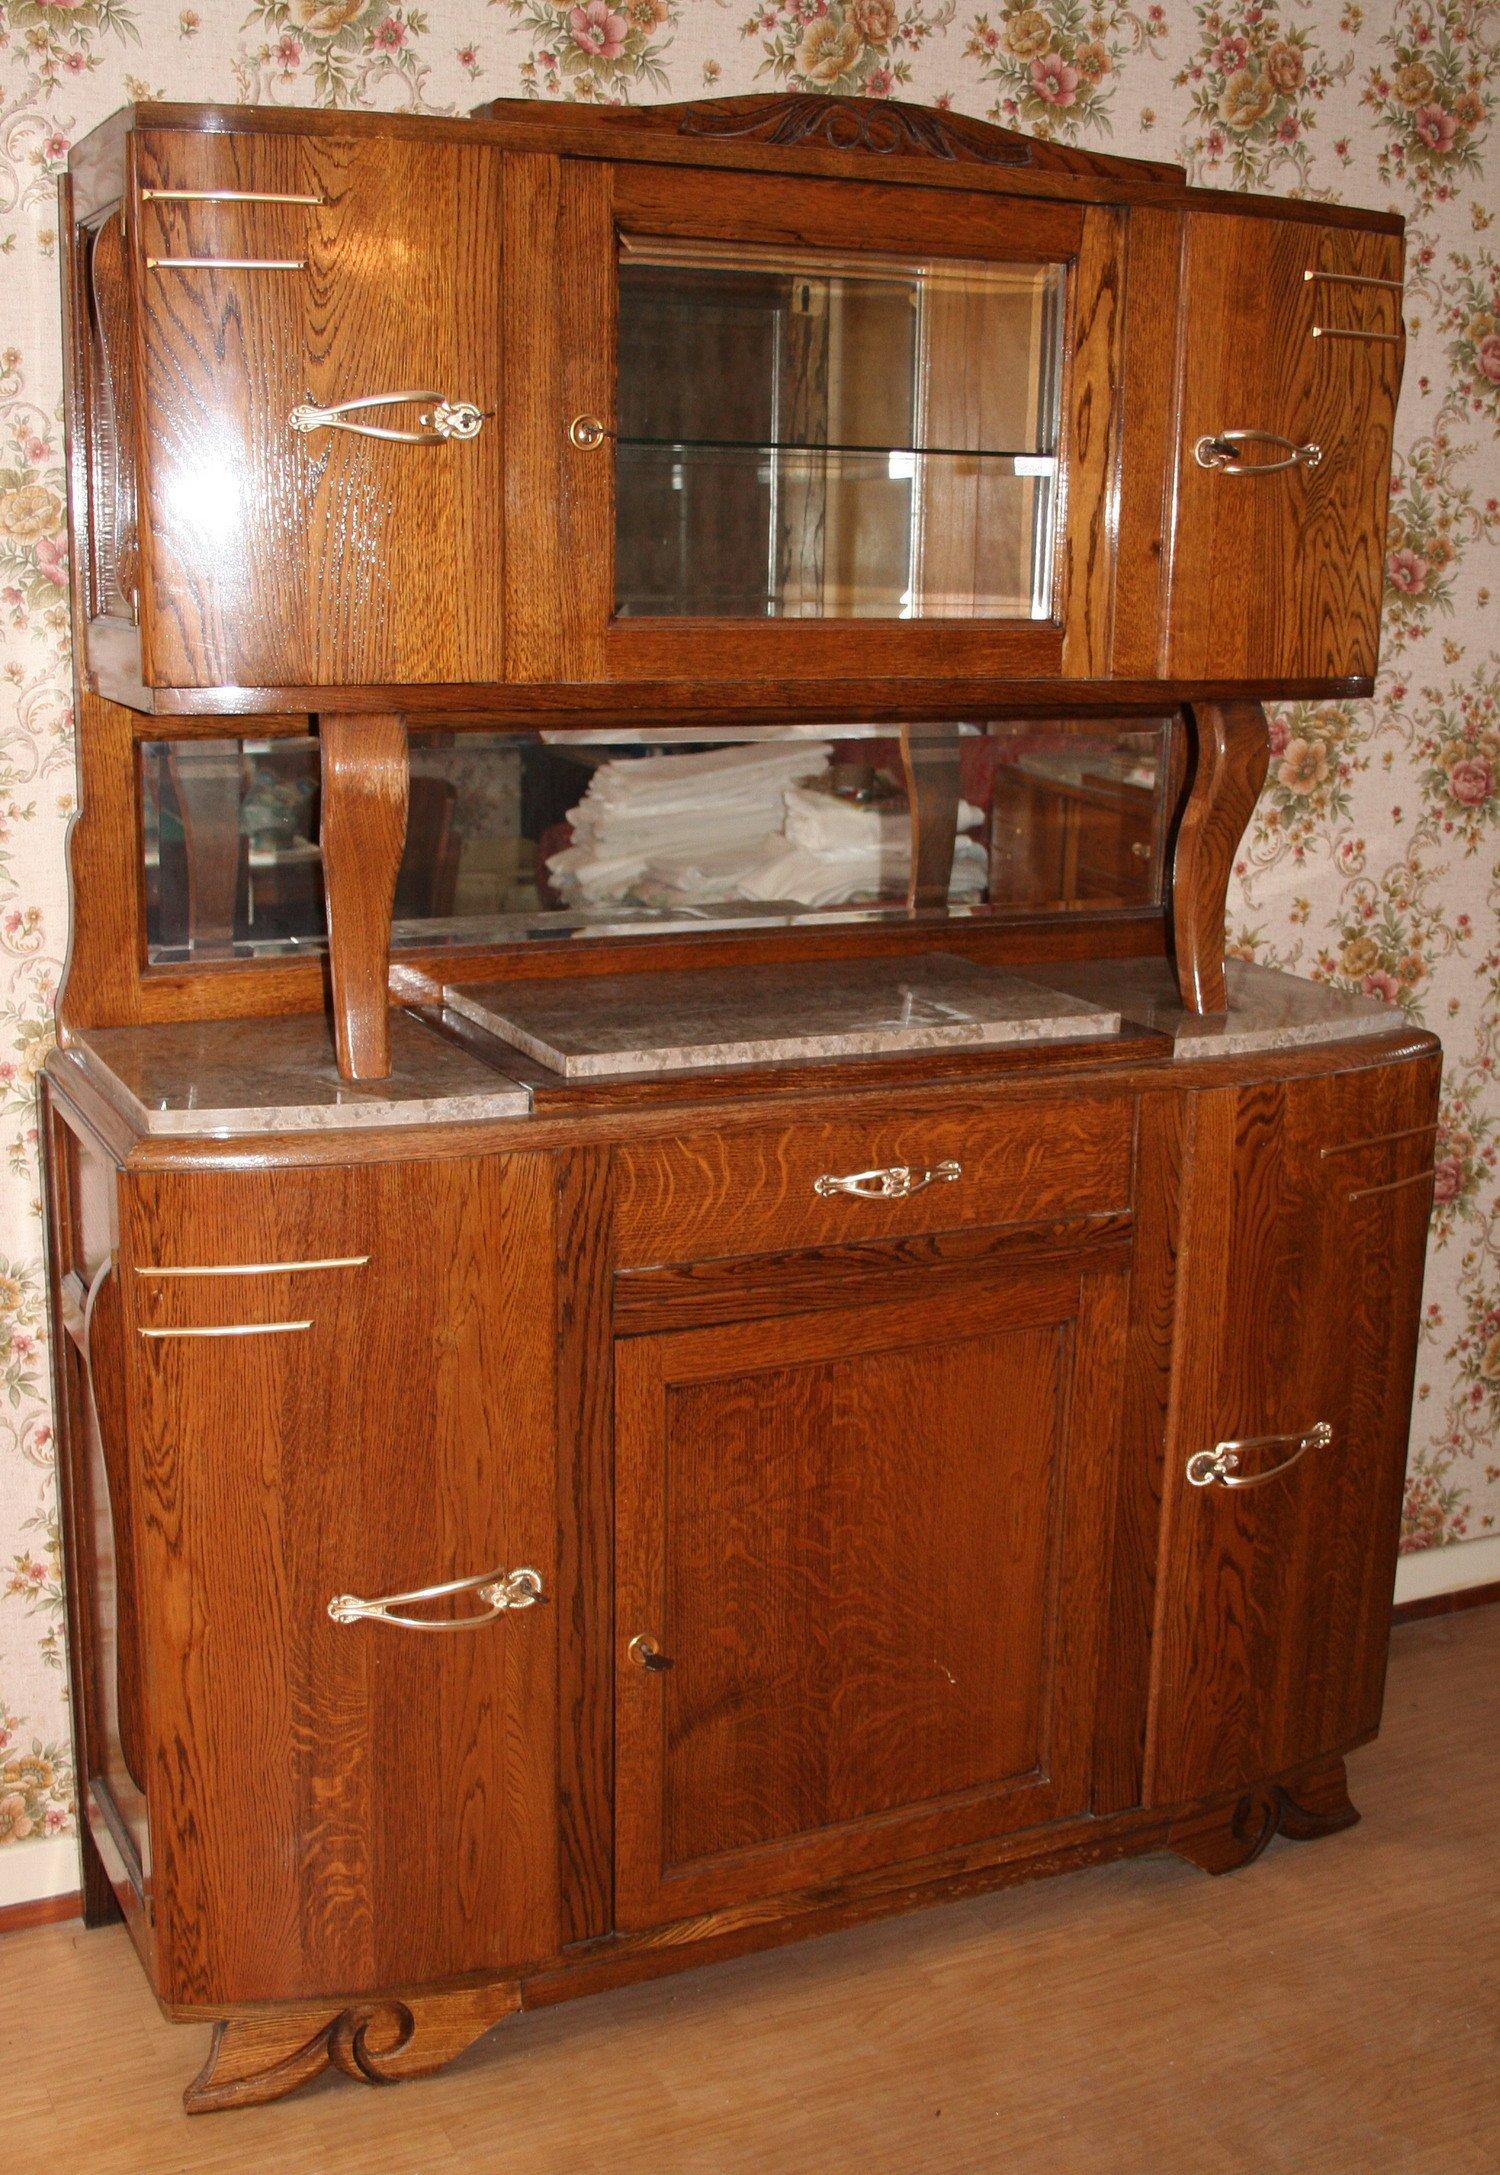 Vente de meubles Buffet vitrine en bois massif – 09